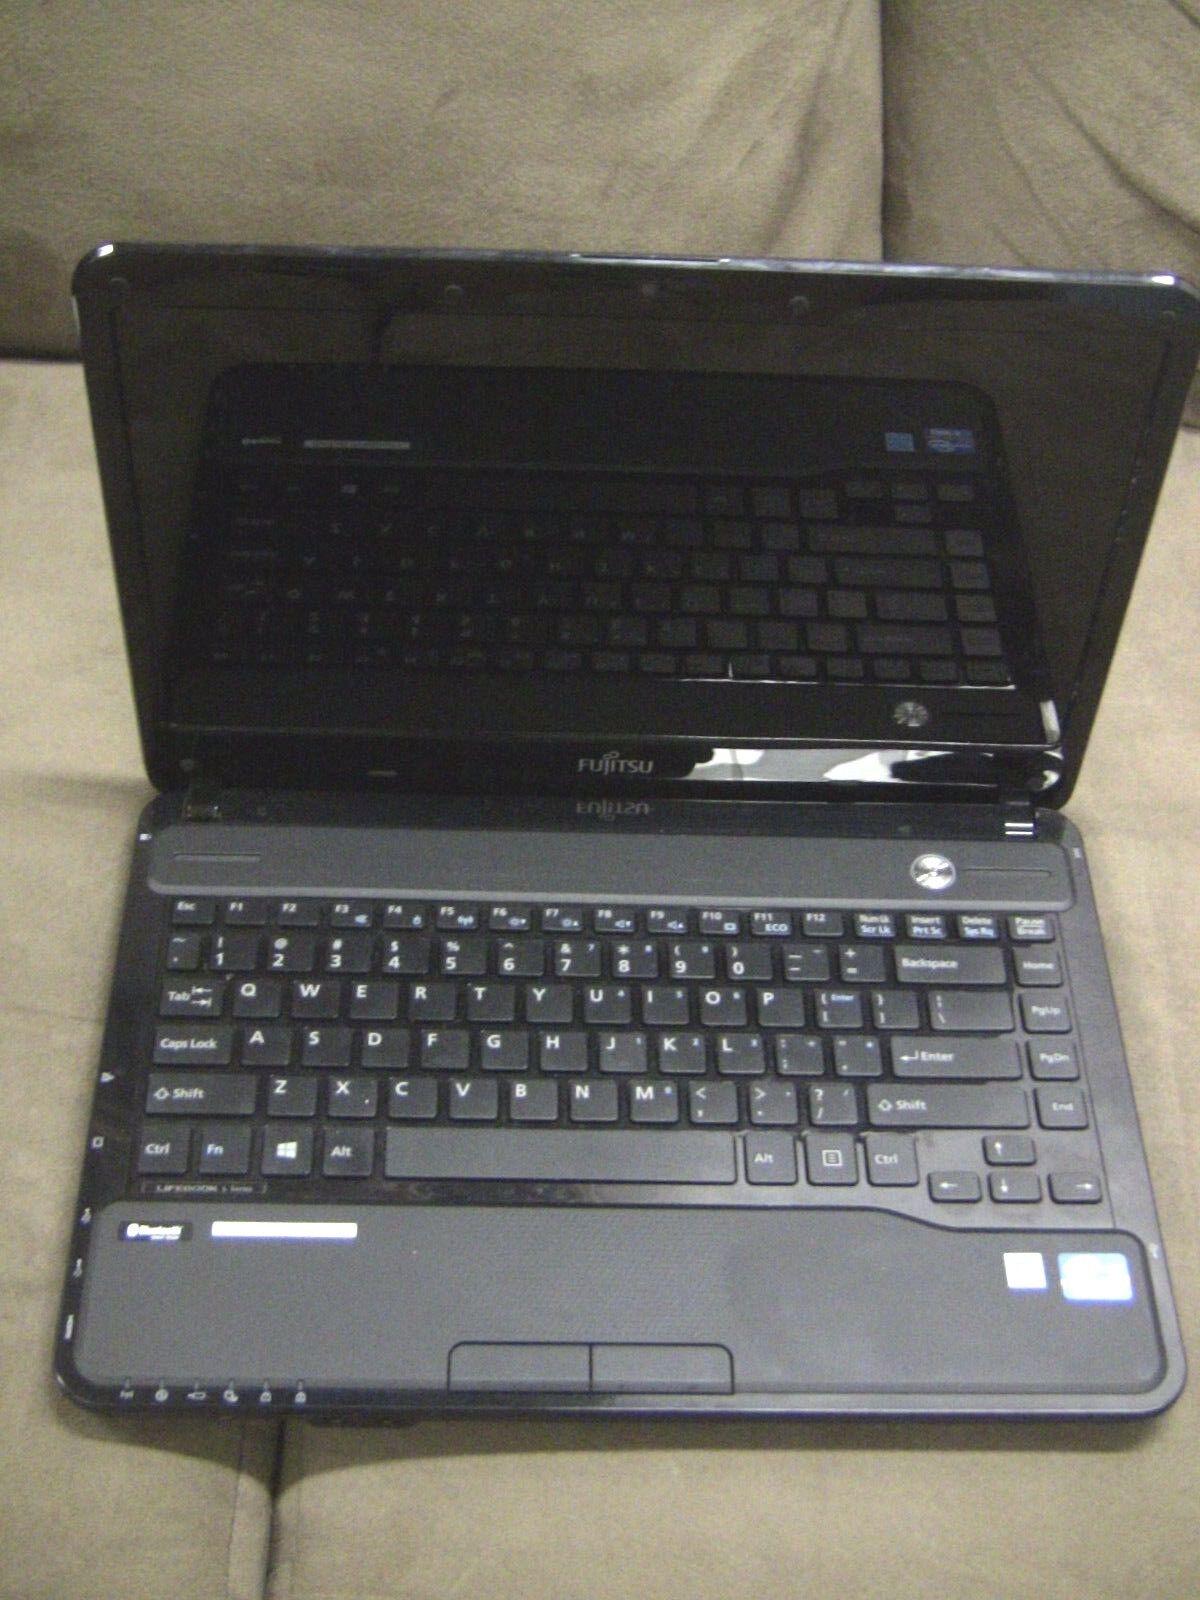 Fujitsu Litebook L Series LH532 Core i5 -3210M, 6 GB Ram, Powers On, No Hrd Dr